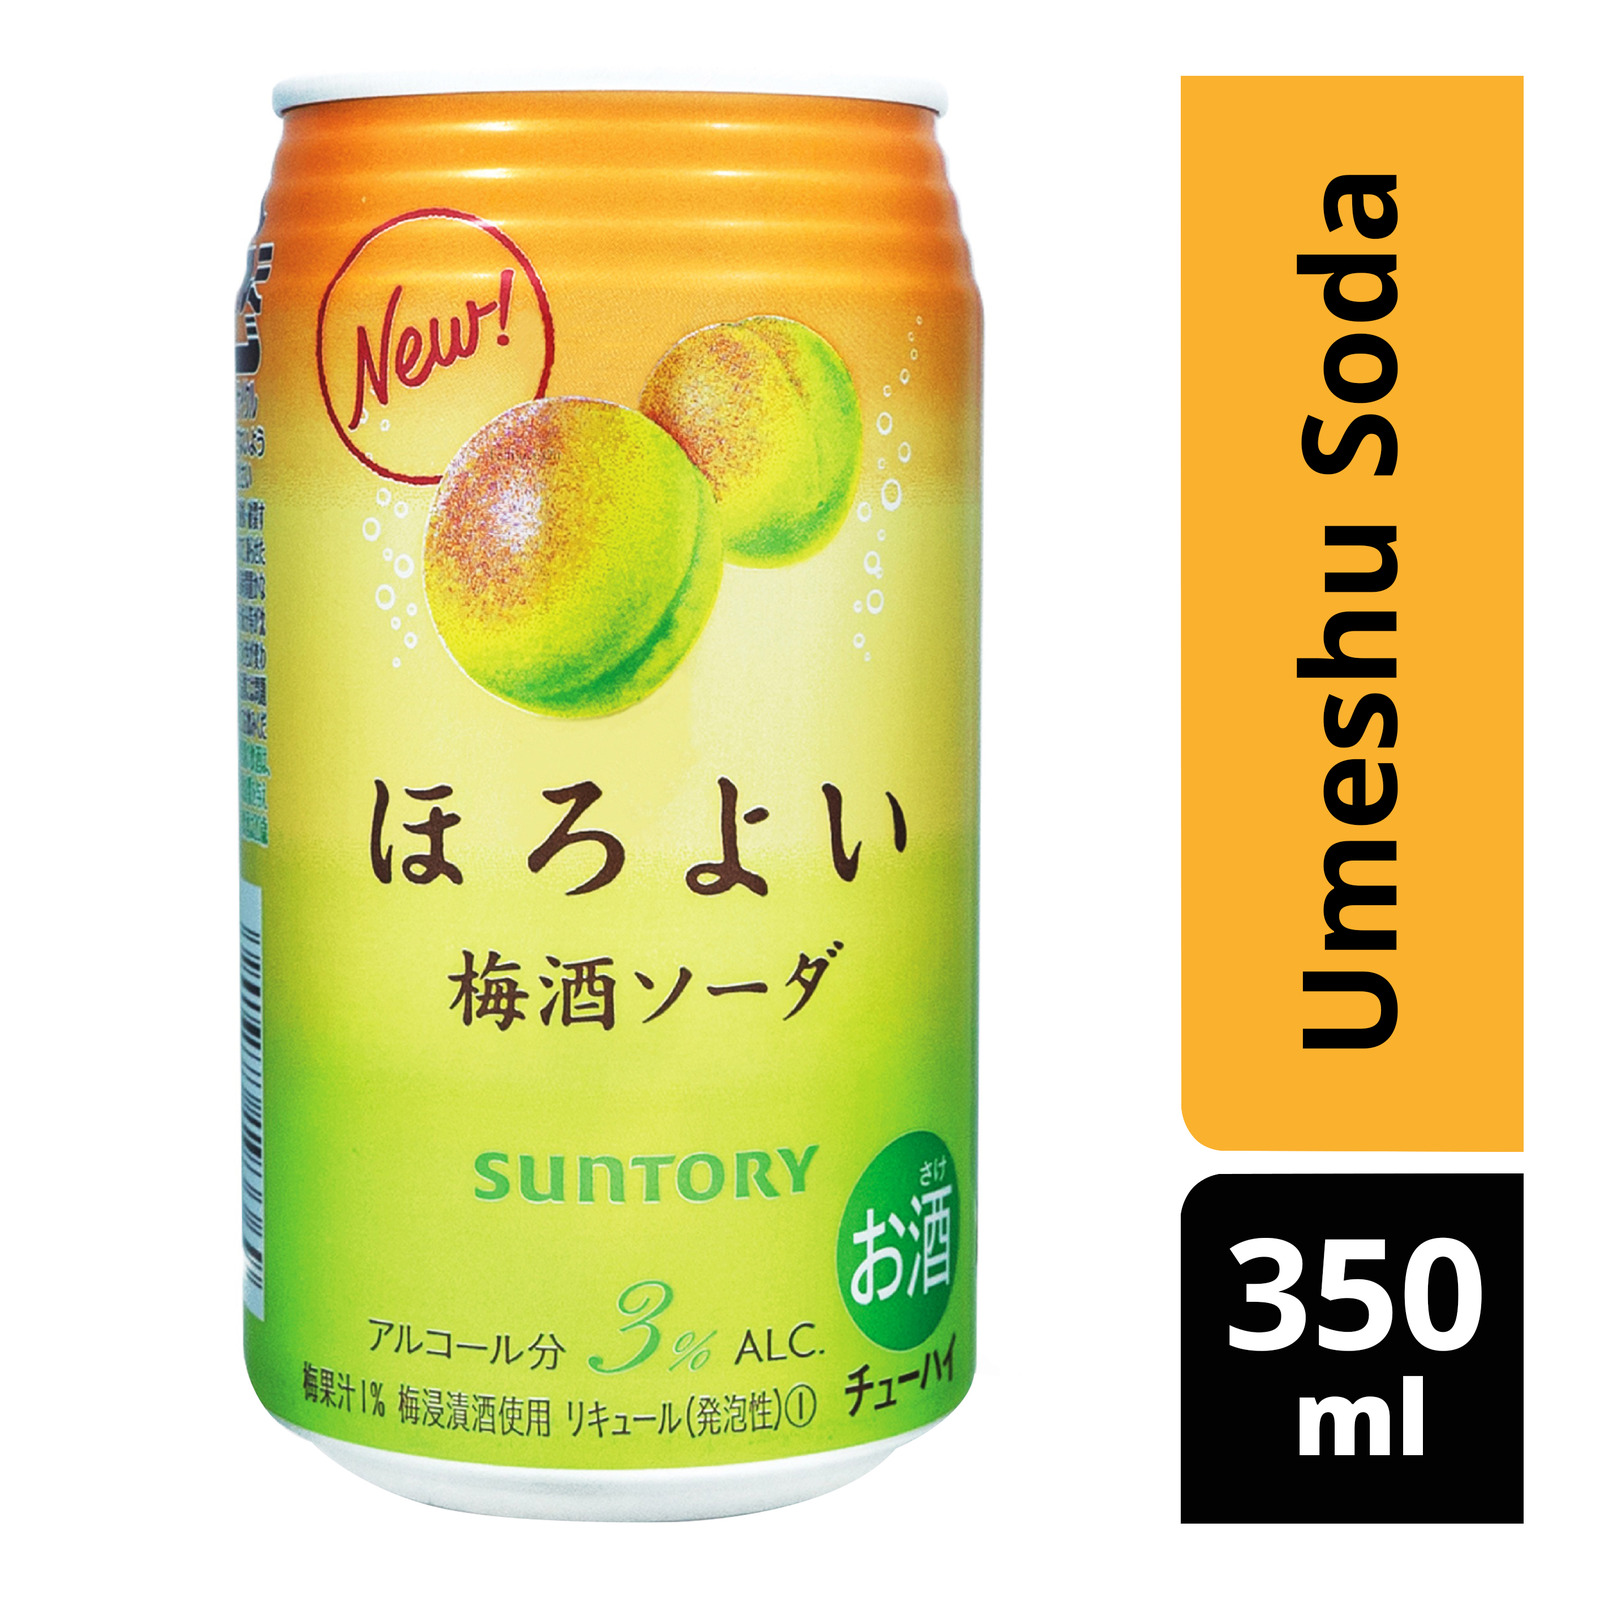 Suntory Horoyoi Shochu Cocktail Can Drink - Umeshu Soda